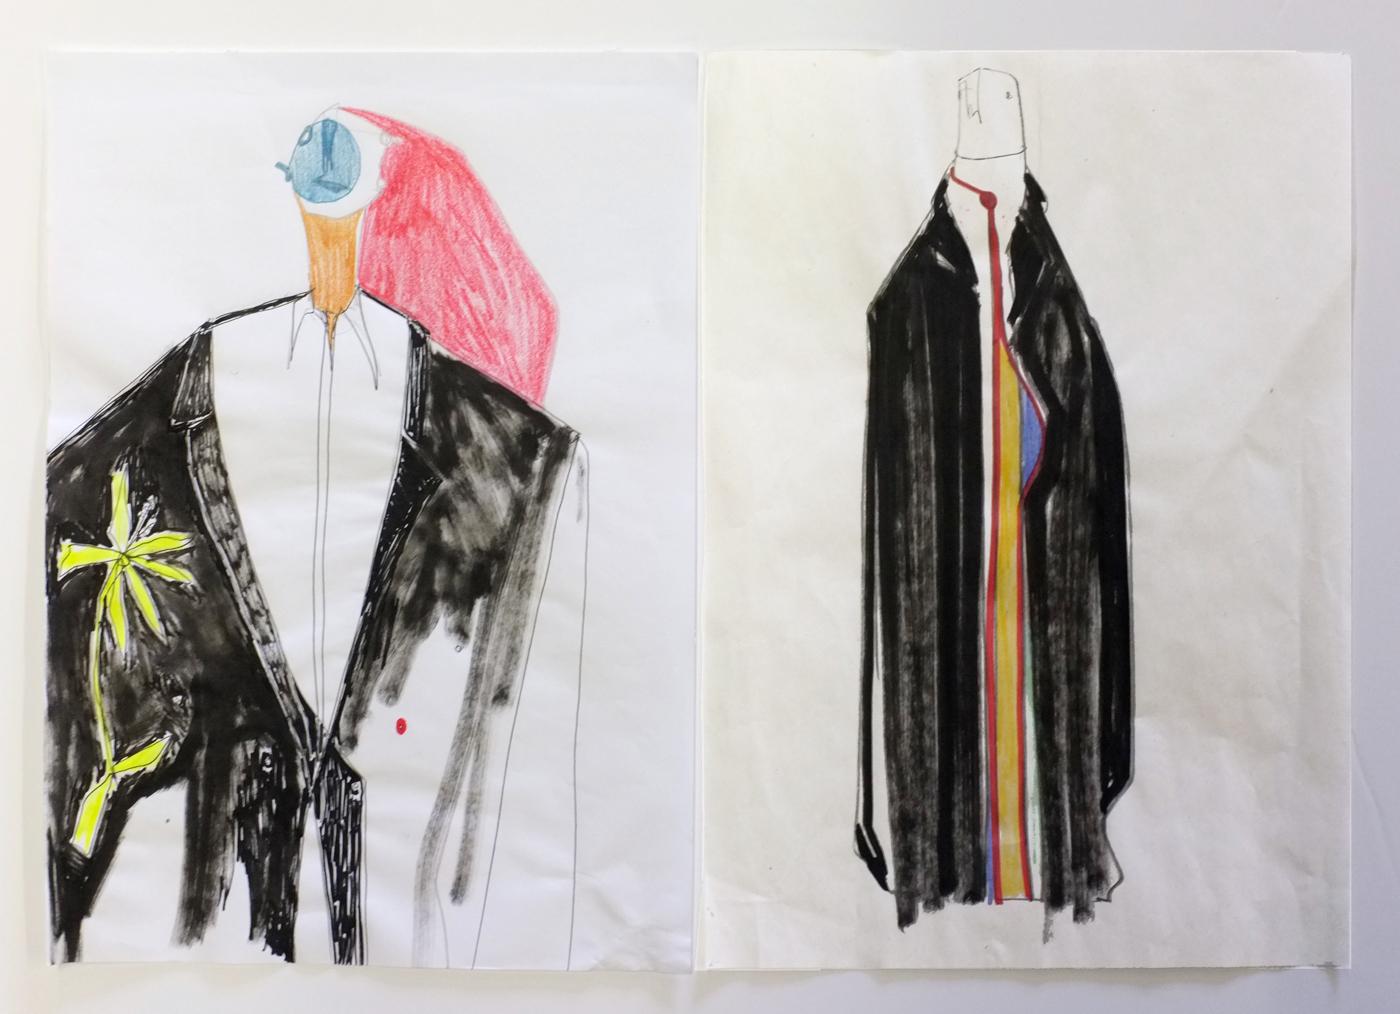 Charles Jeffrey, MA Fashion Womenswear